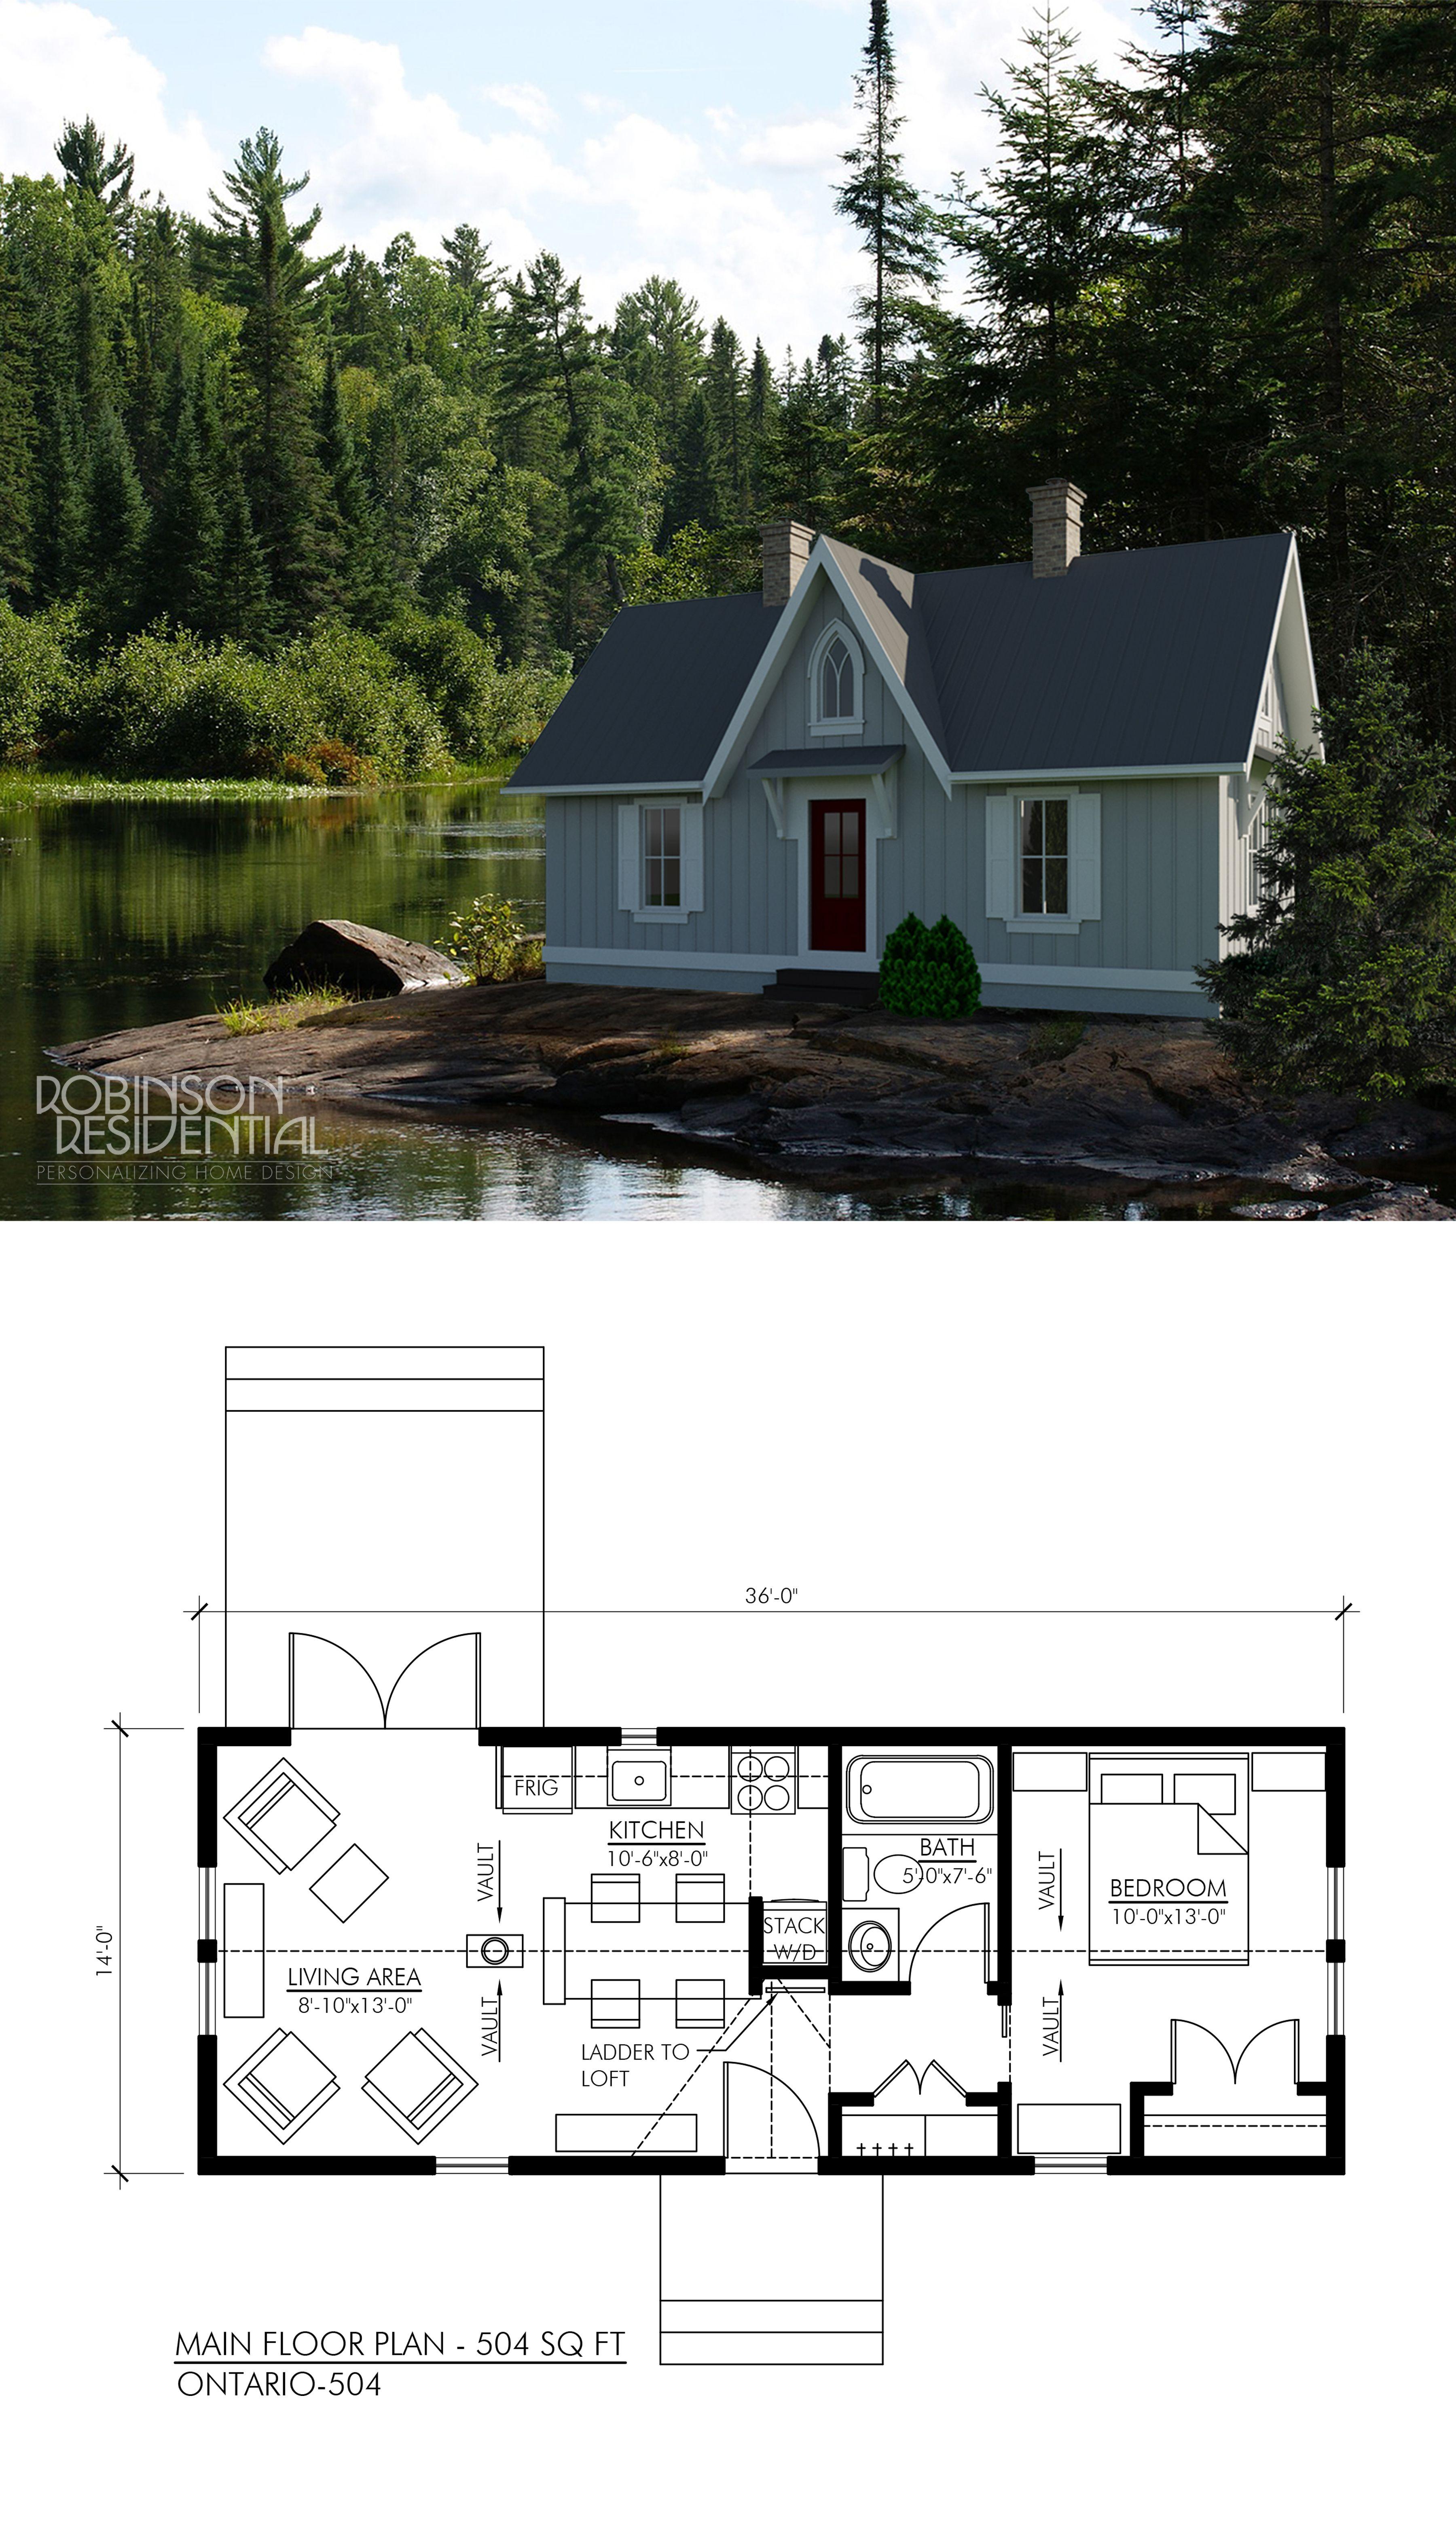 Ontario 504 Robinson Plans Tiny House Floor Plans Small Tiny House Tiny House Plans